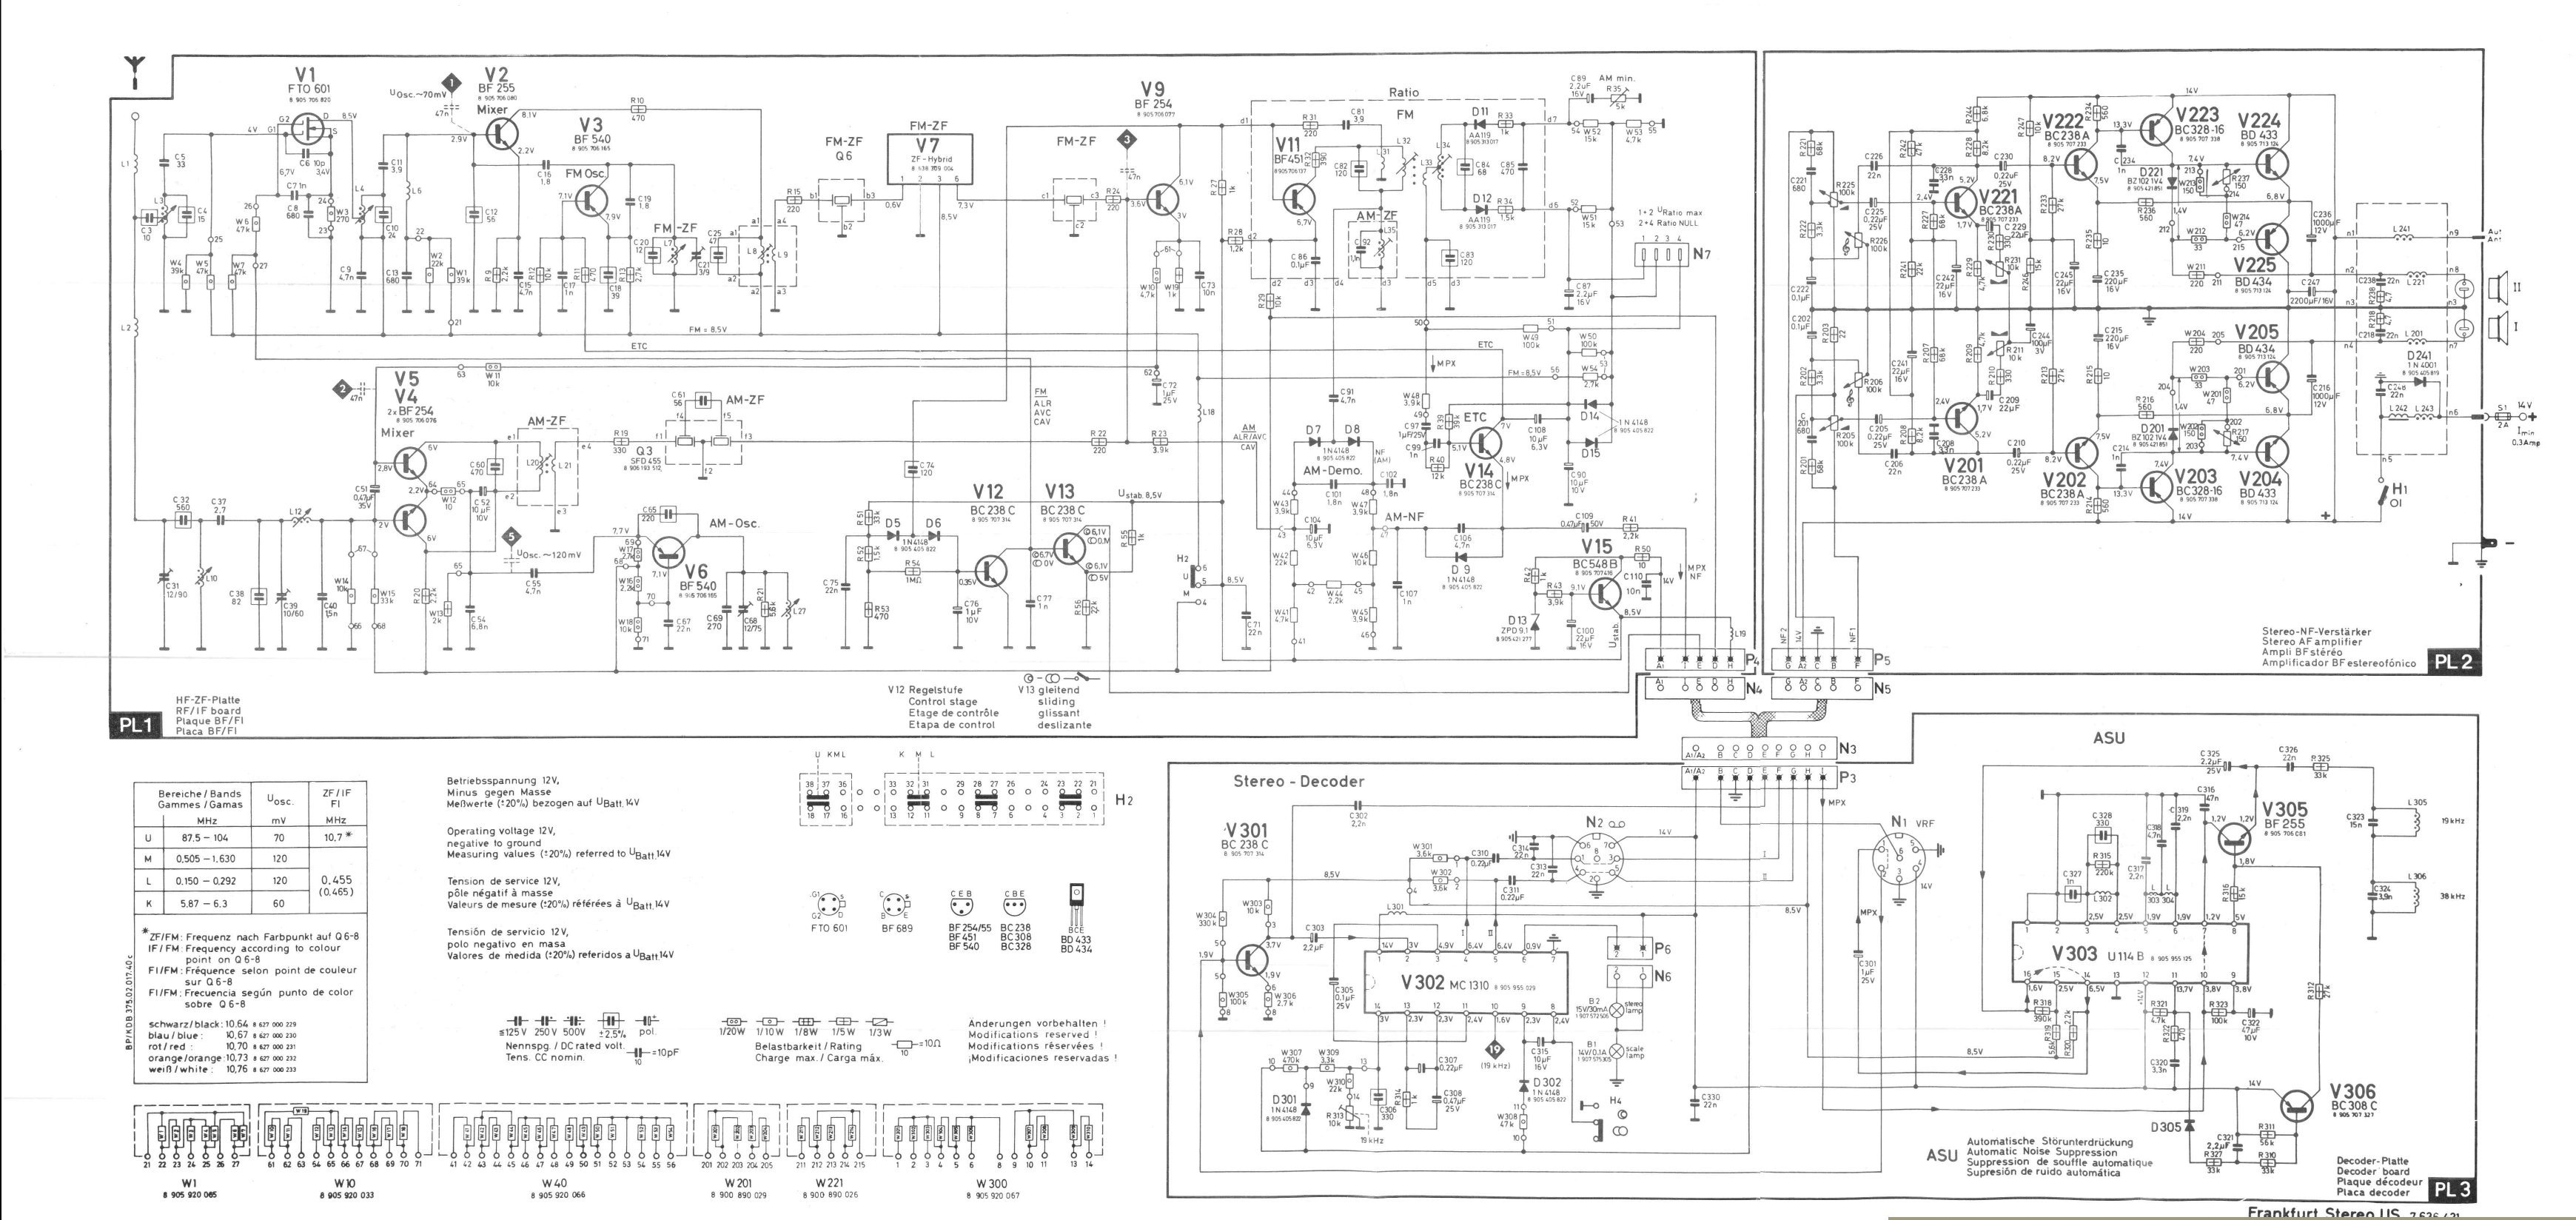 Blaupunkt Radio Wiring Harness : Thesamba blaupunkt frankfurt stereo us schematic